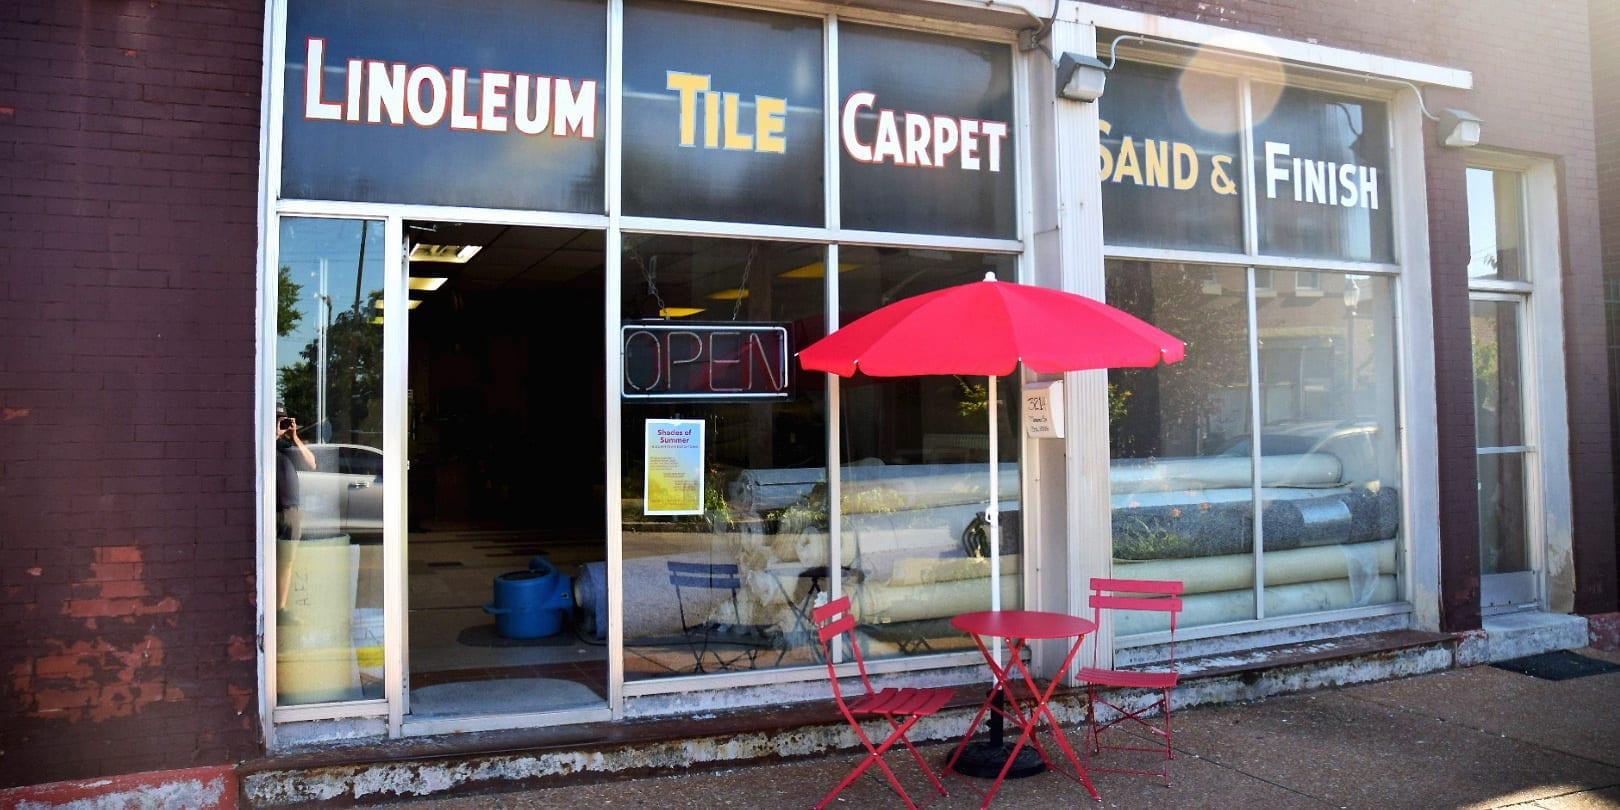 New sidewalk furniture in front of Greenfield Flooring on Meramec Street in Downtown Dutchtown.